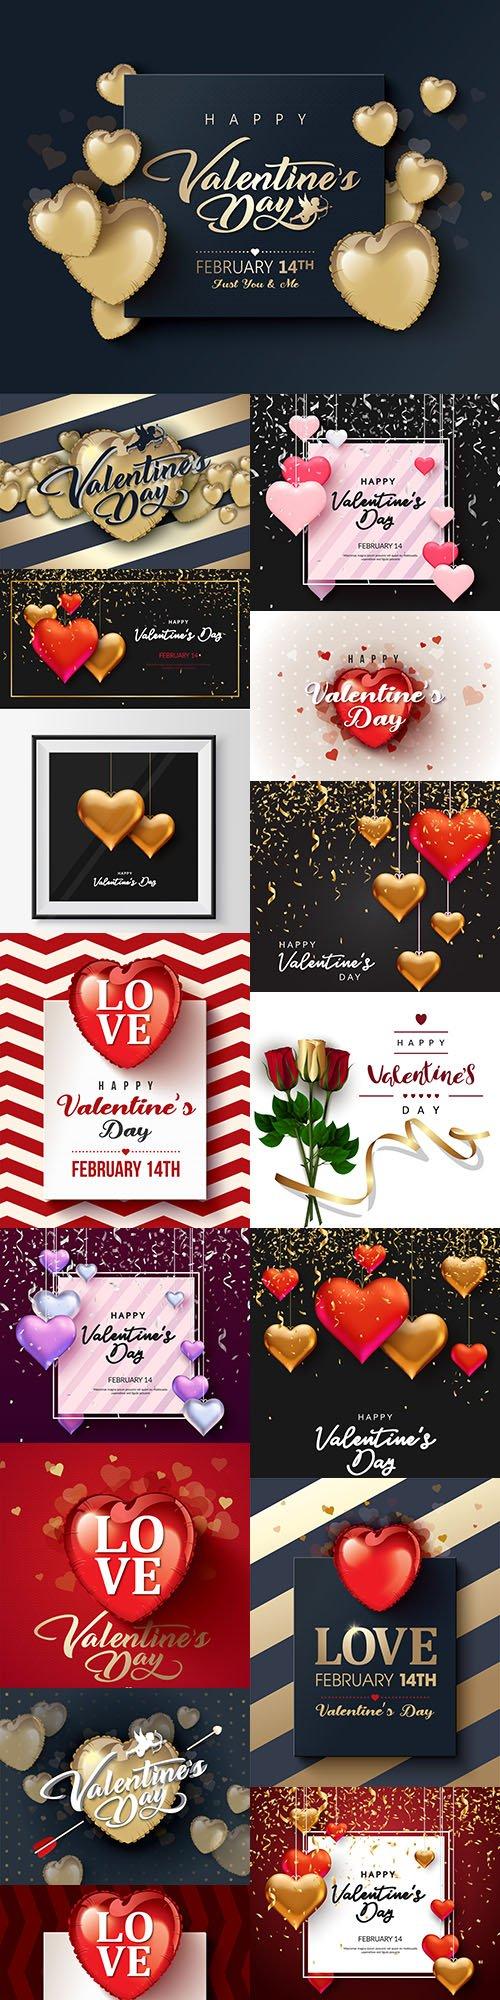 Happy Valentine's Day romantic decorative illustrations 24